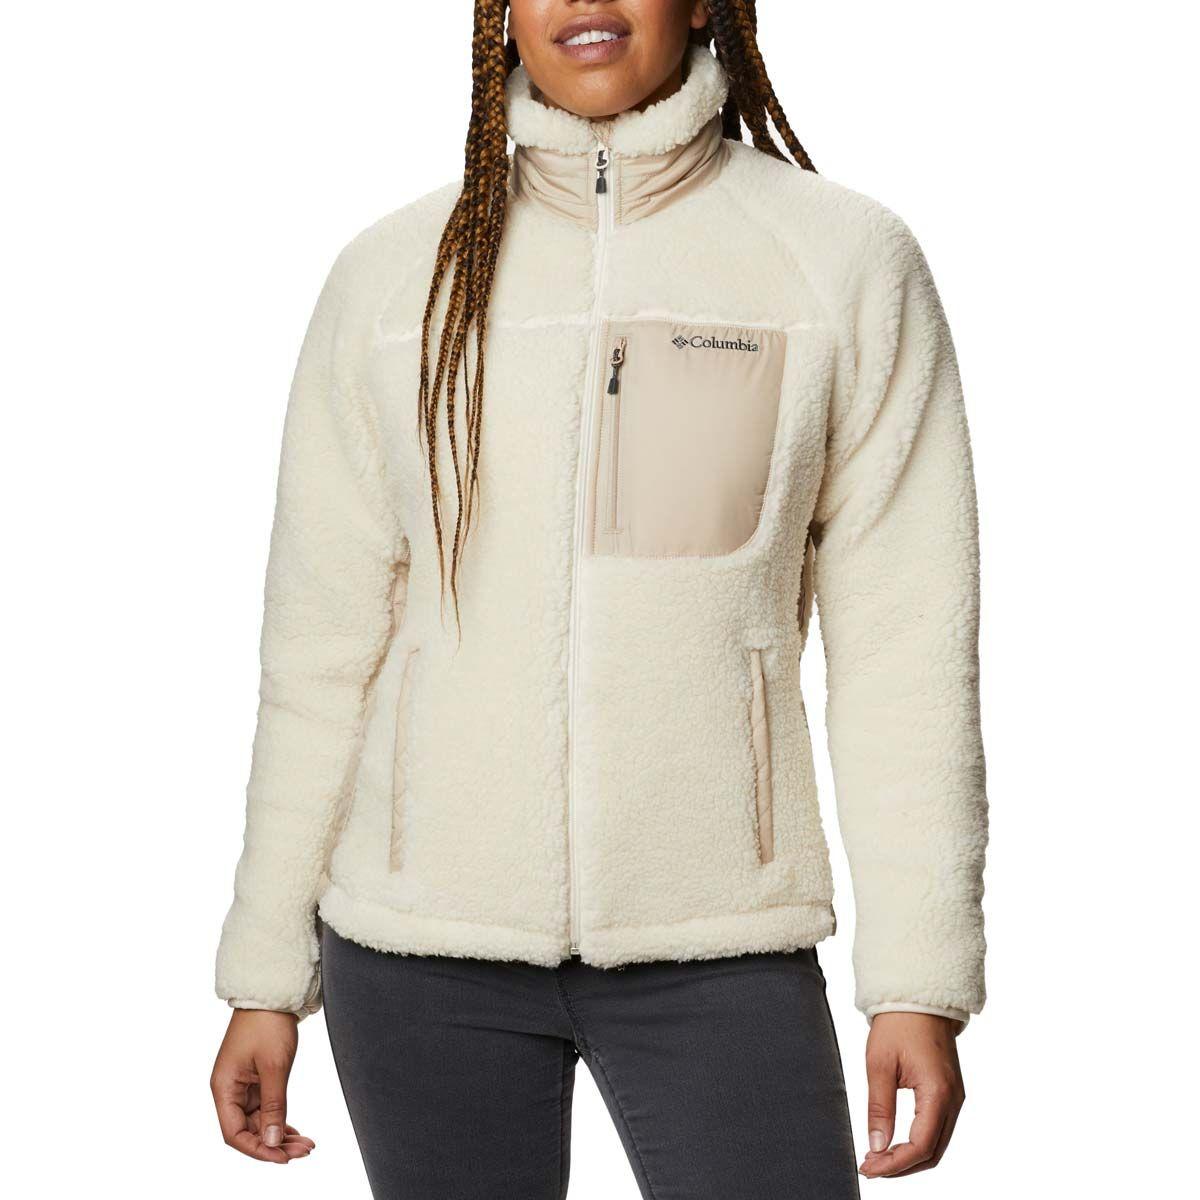 Columbia giacca archer ridge II donna bianco panna